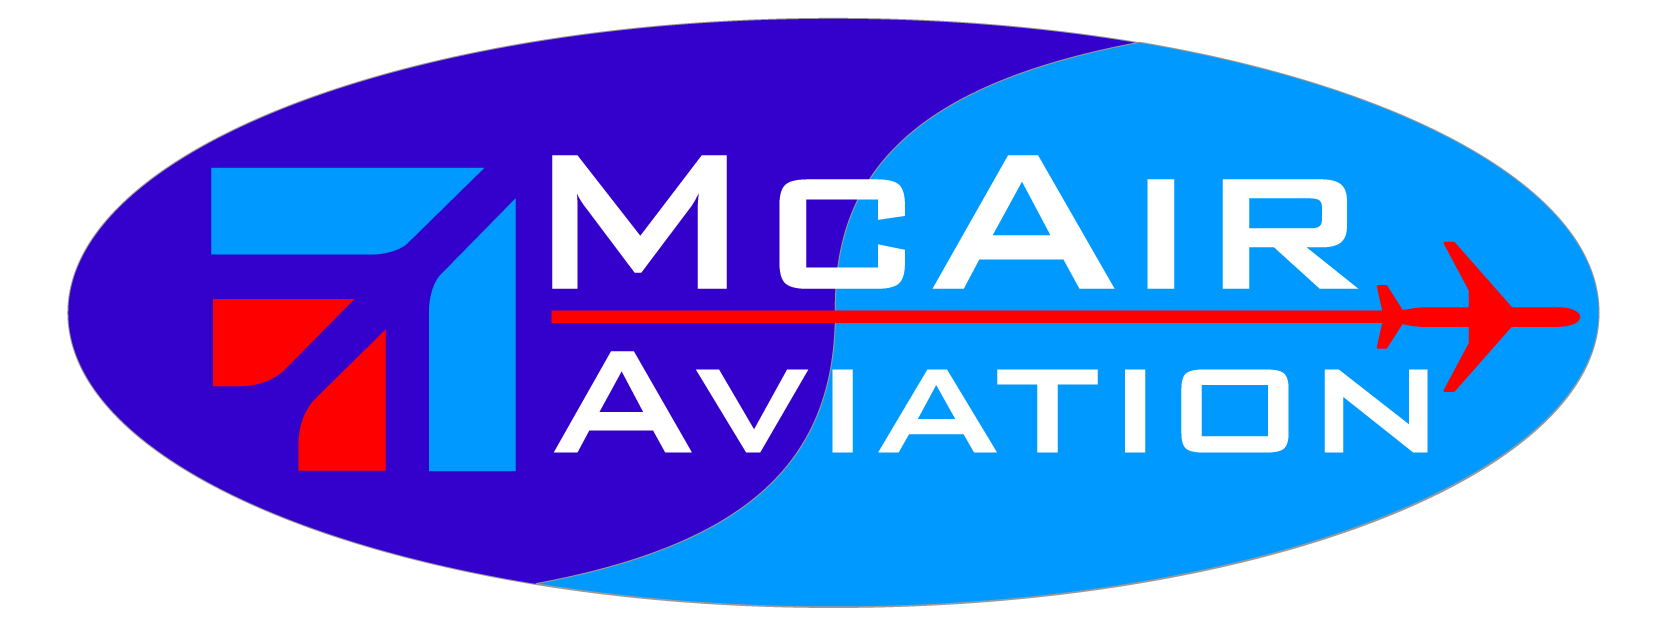 McAir-Aviation logo